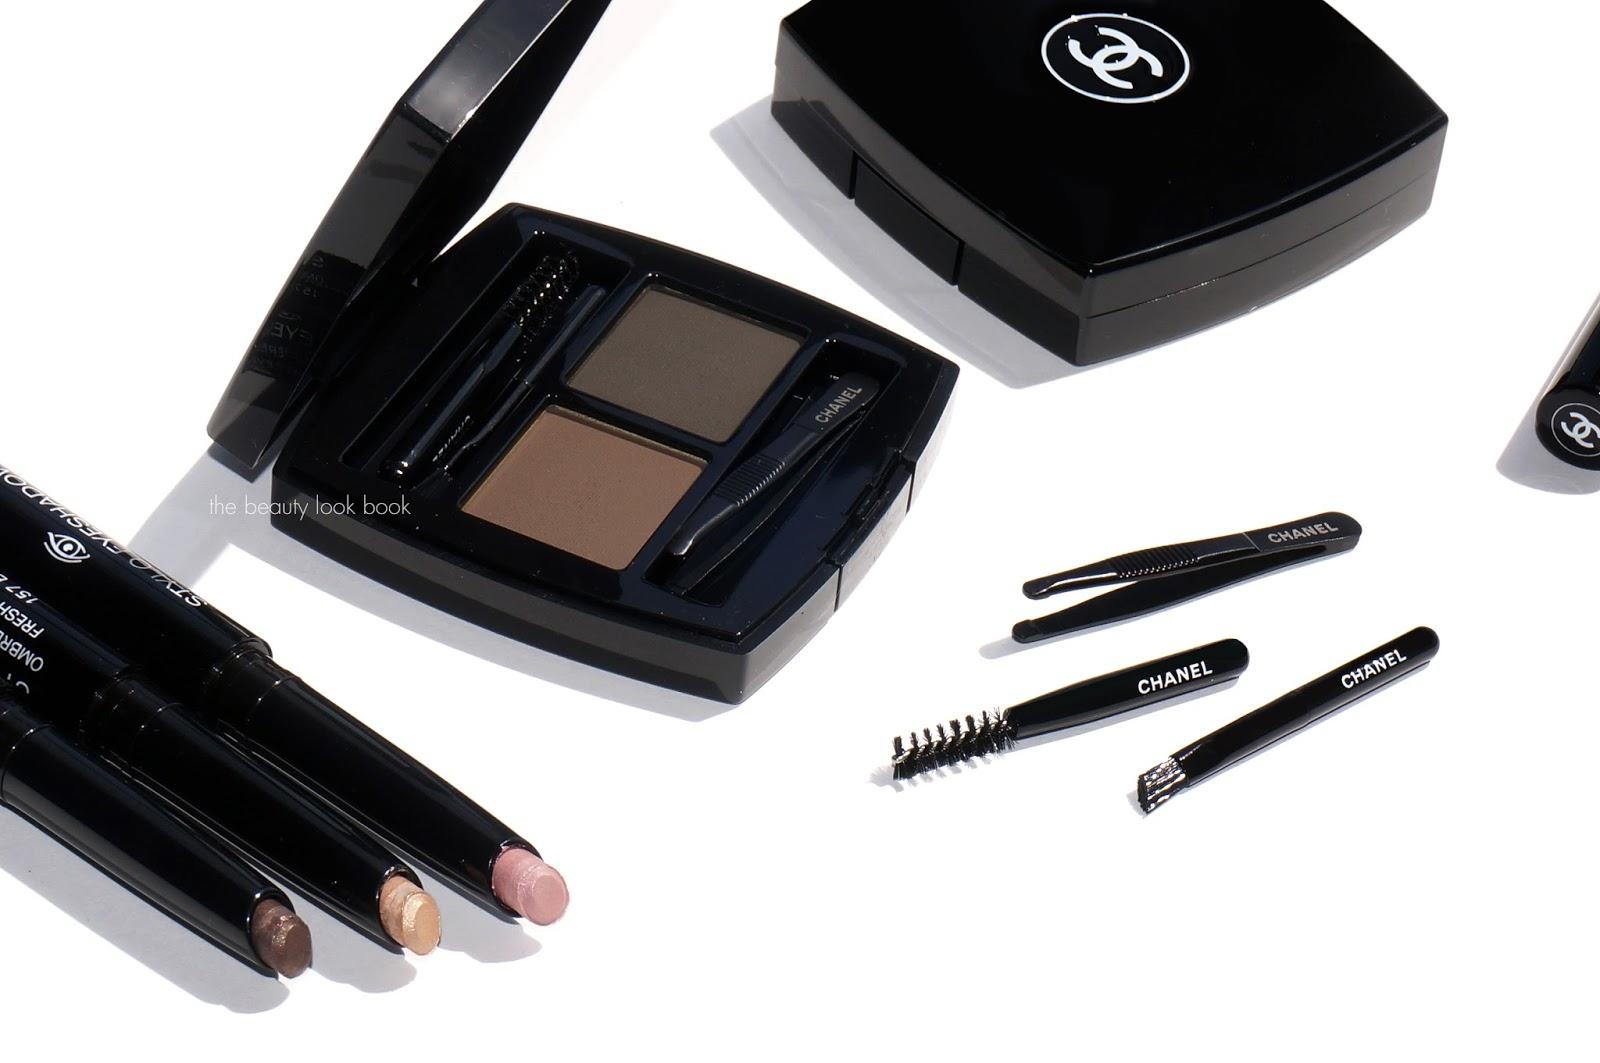 New Chanel Stylo Fresh Effect Eyeshadows And La Palette Sourcils De